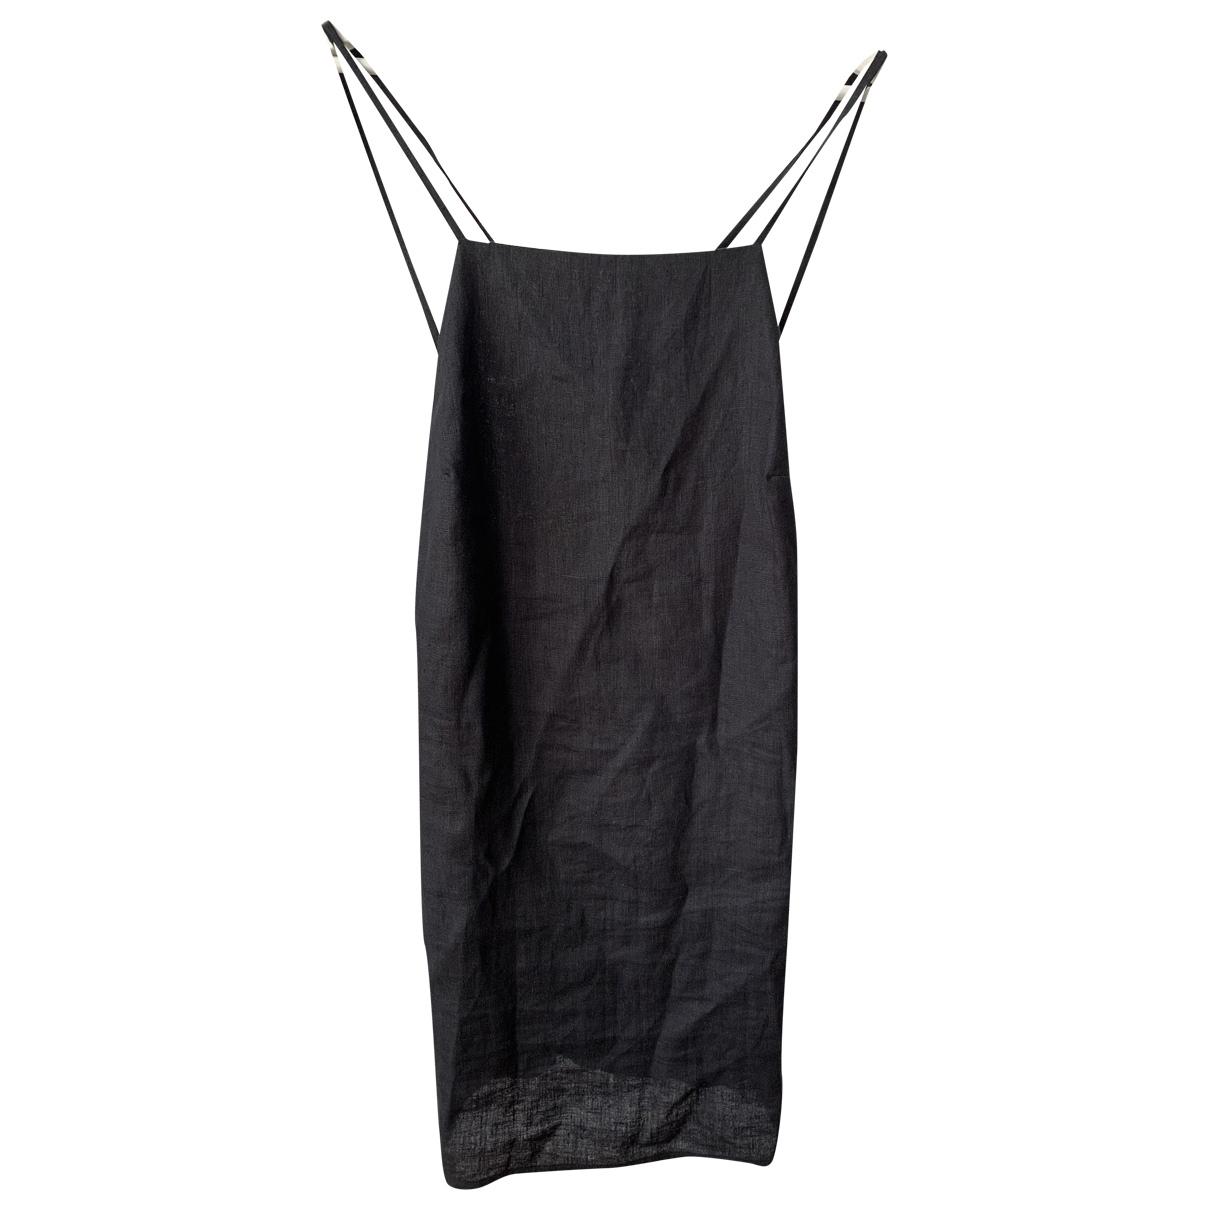 Reformation N Black Linen dress for Women L International